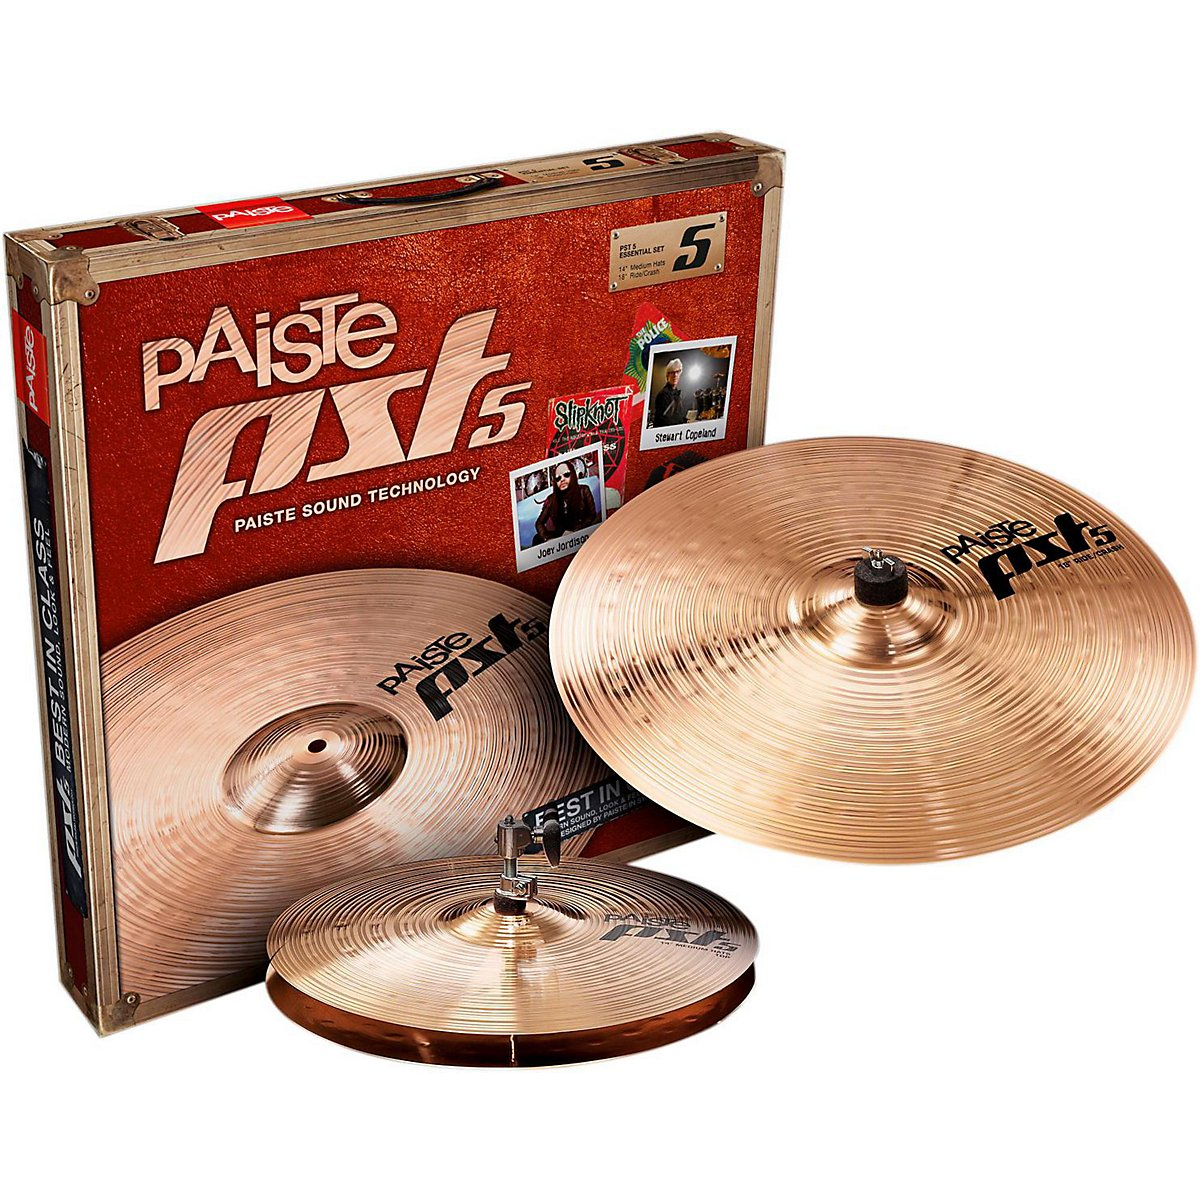 Paiste PST 5 Essential Set 14/18 in. by Paiste